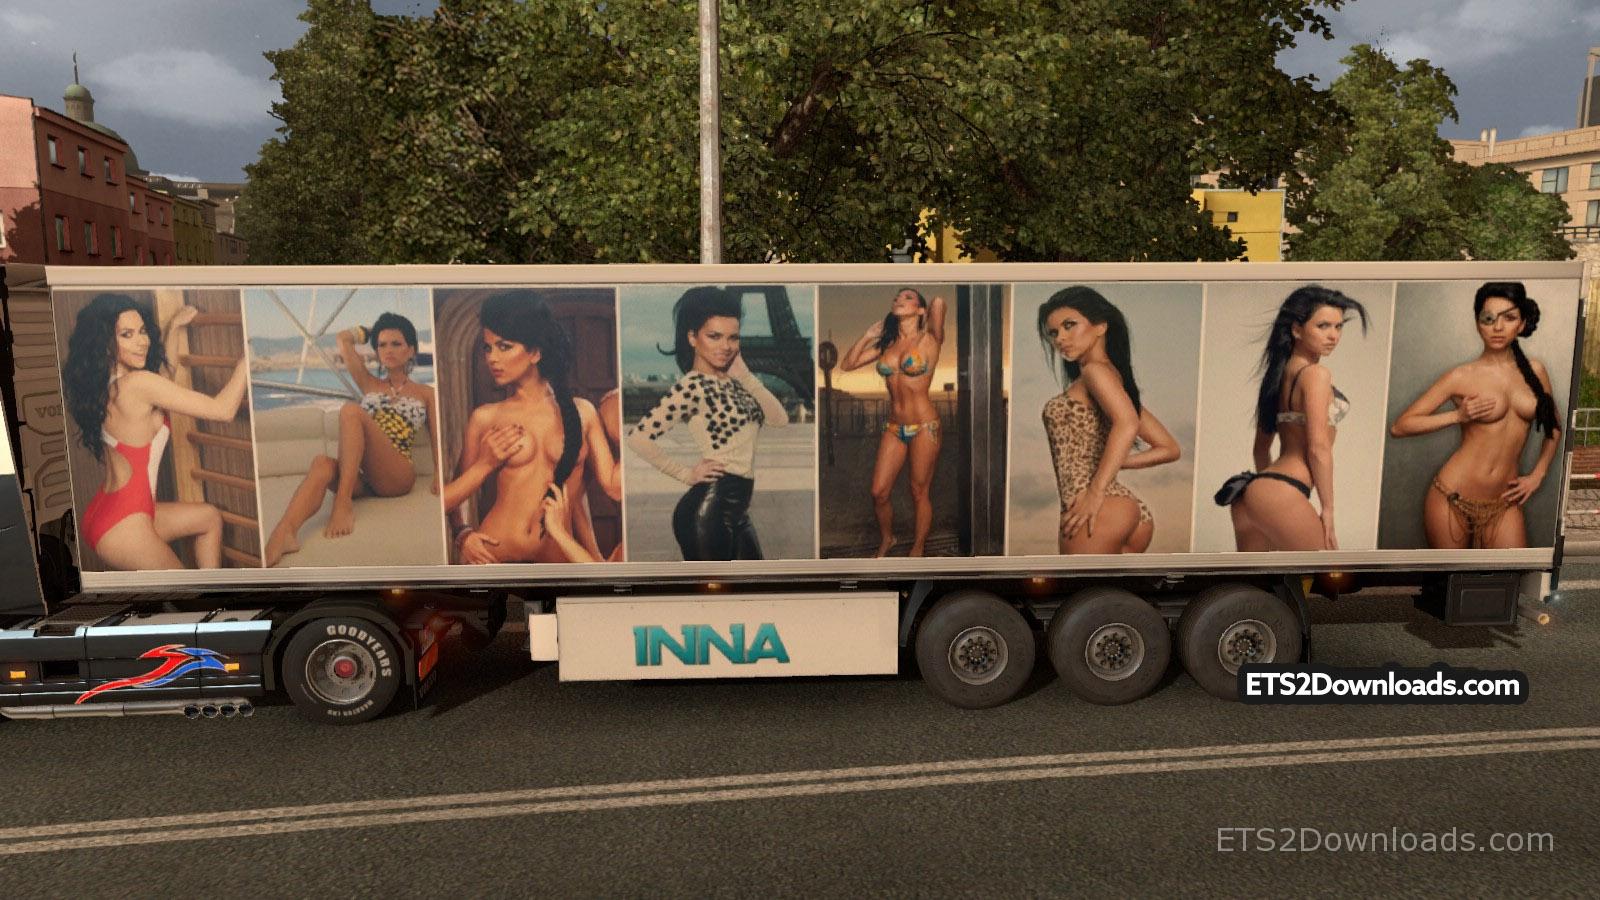 inna-trailer